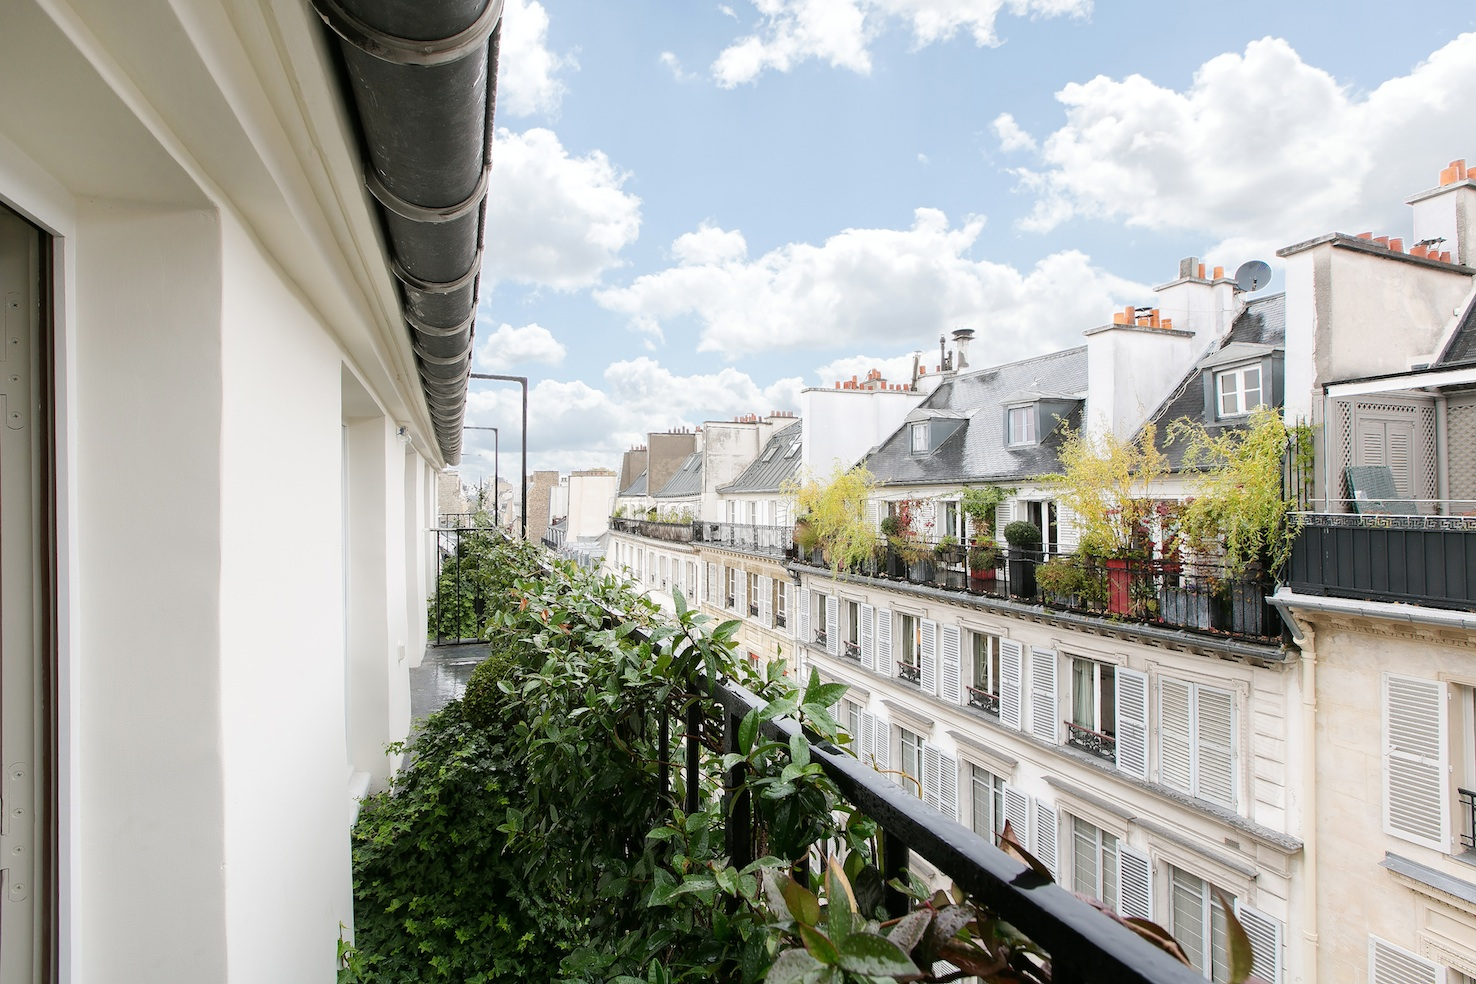 Duplex por un Venta en Rue de Varenne - id. 1567 Paris, Paris 75007 Francia